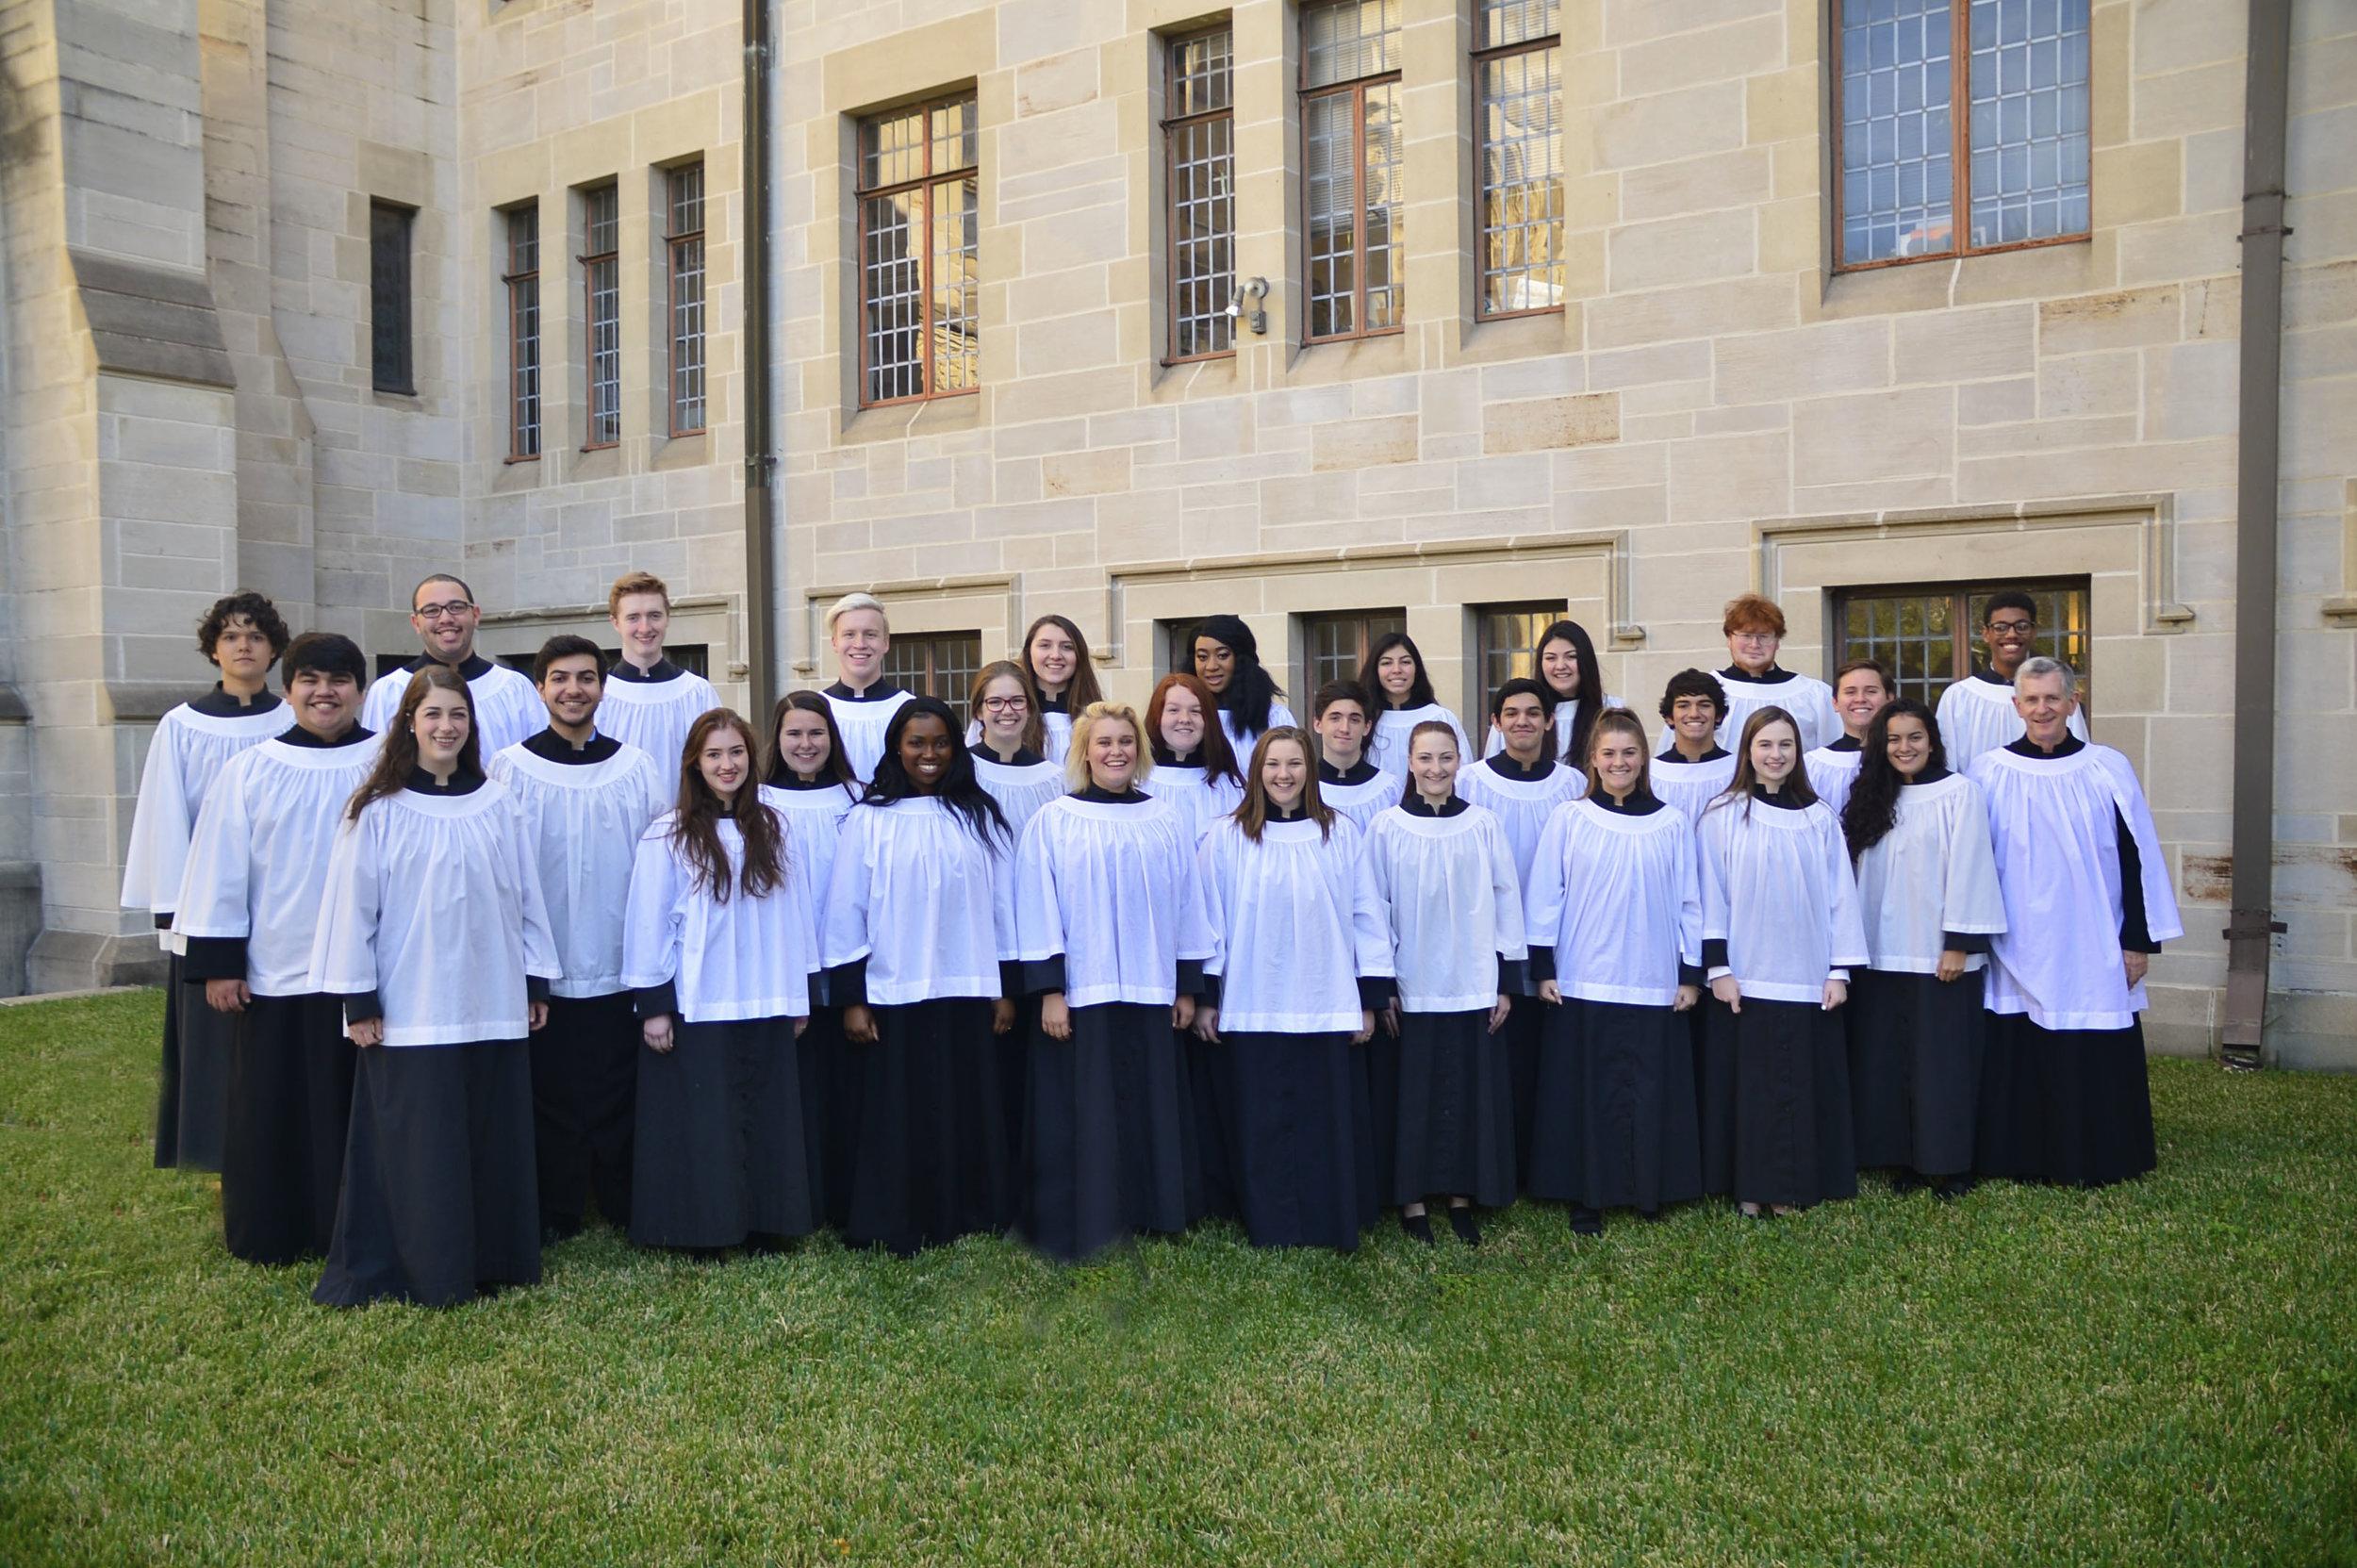 choir1.jpg